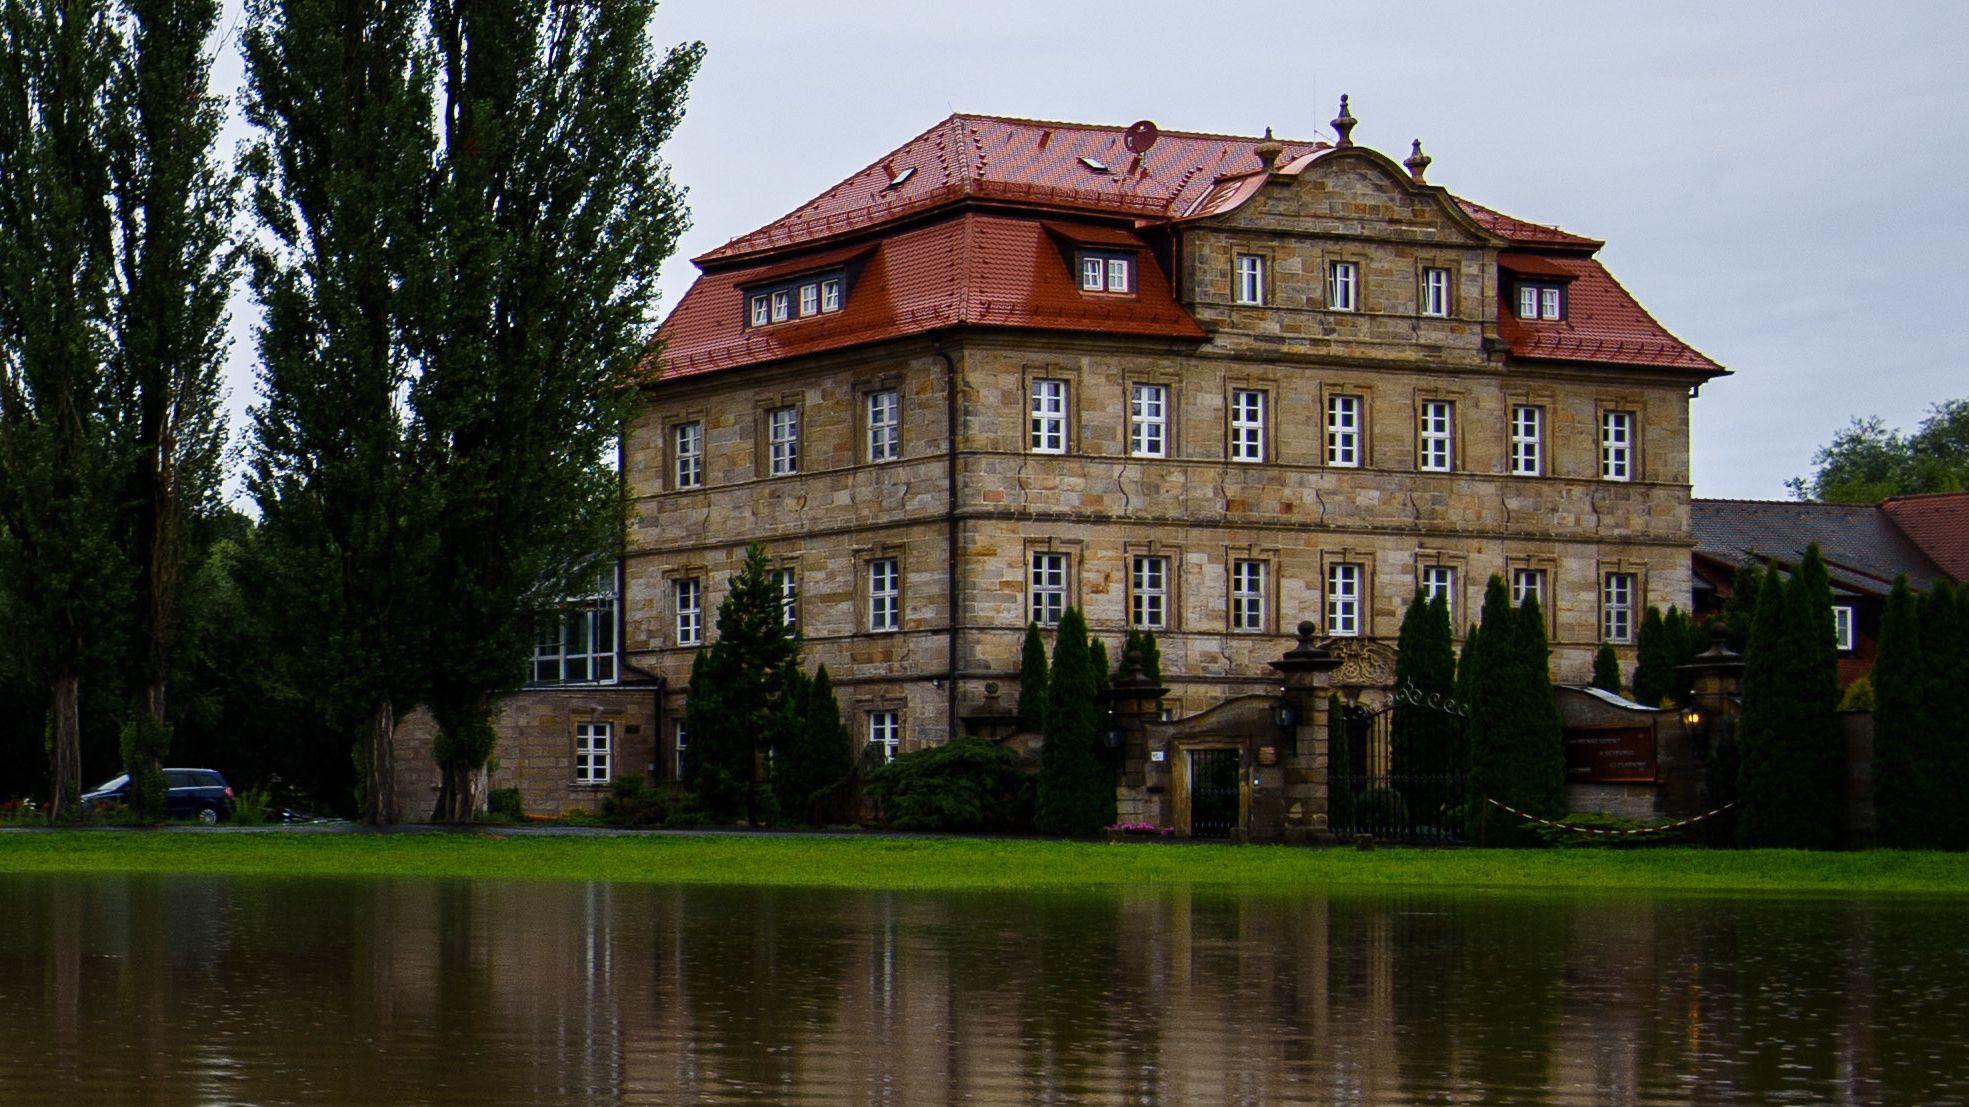 Die Seniorenresidenz Schloss Gleusdorf